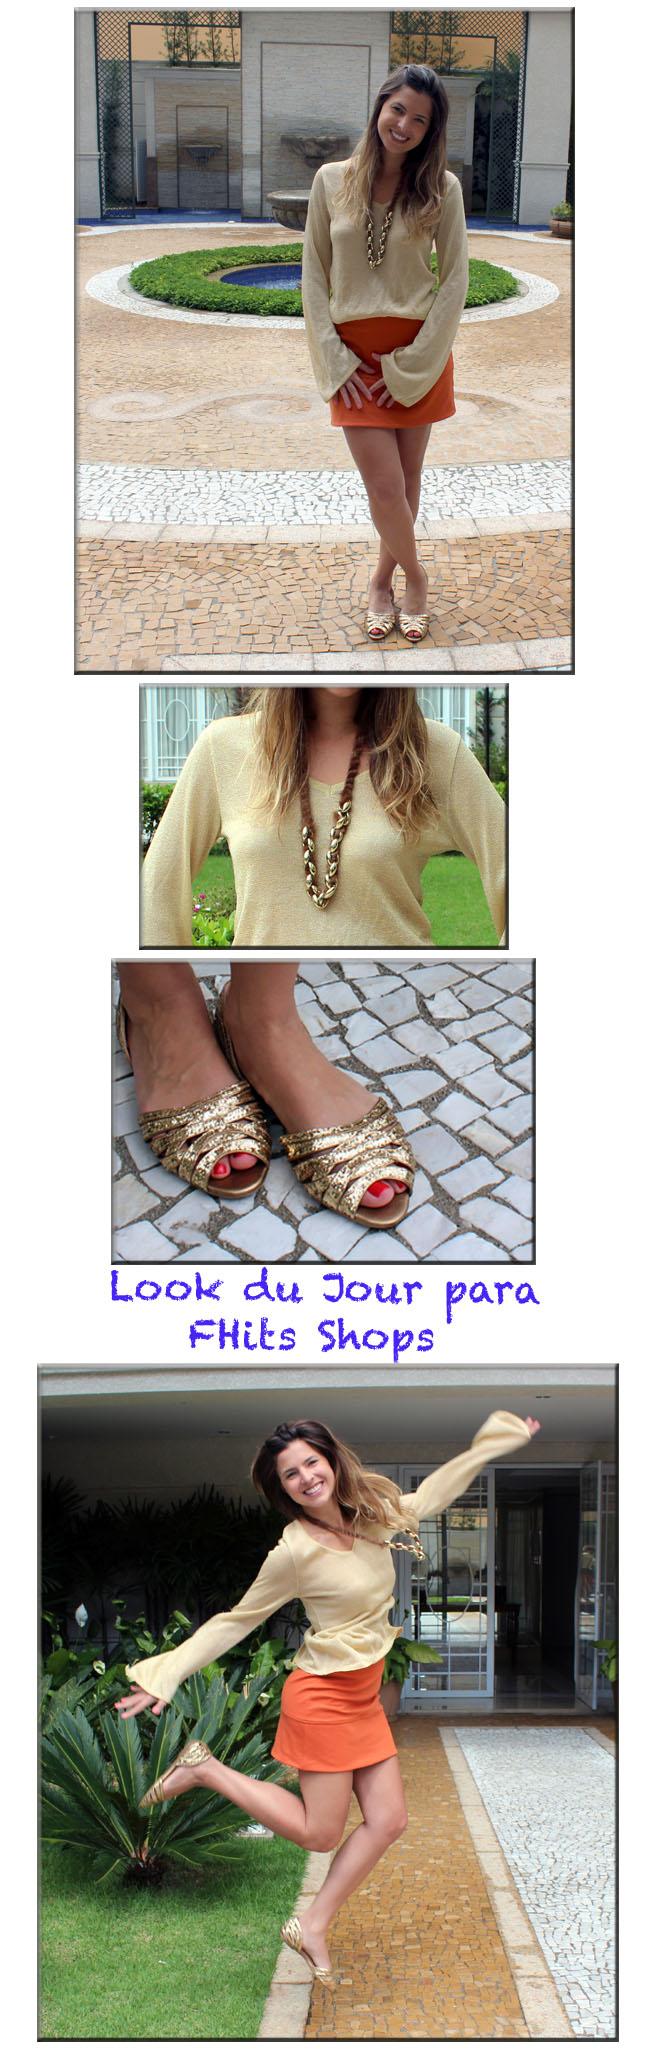 fhits shops, fhits, look pati mattos, foto salto, look do dia, look gold, luiza barcelos, rasteirinha, sandália dourada, sandalias luiza barcelos